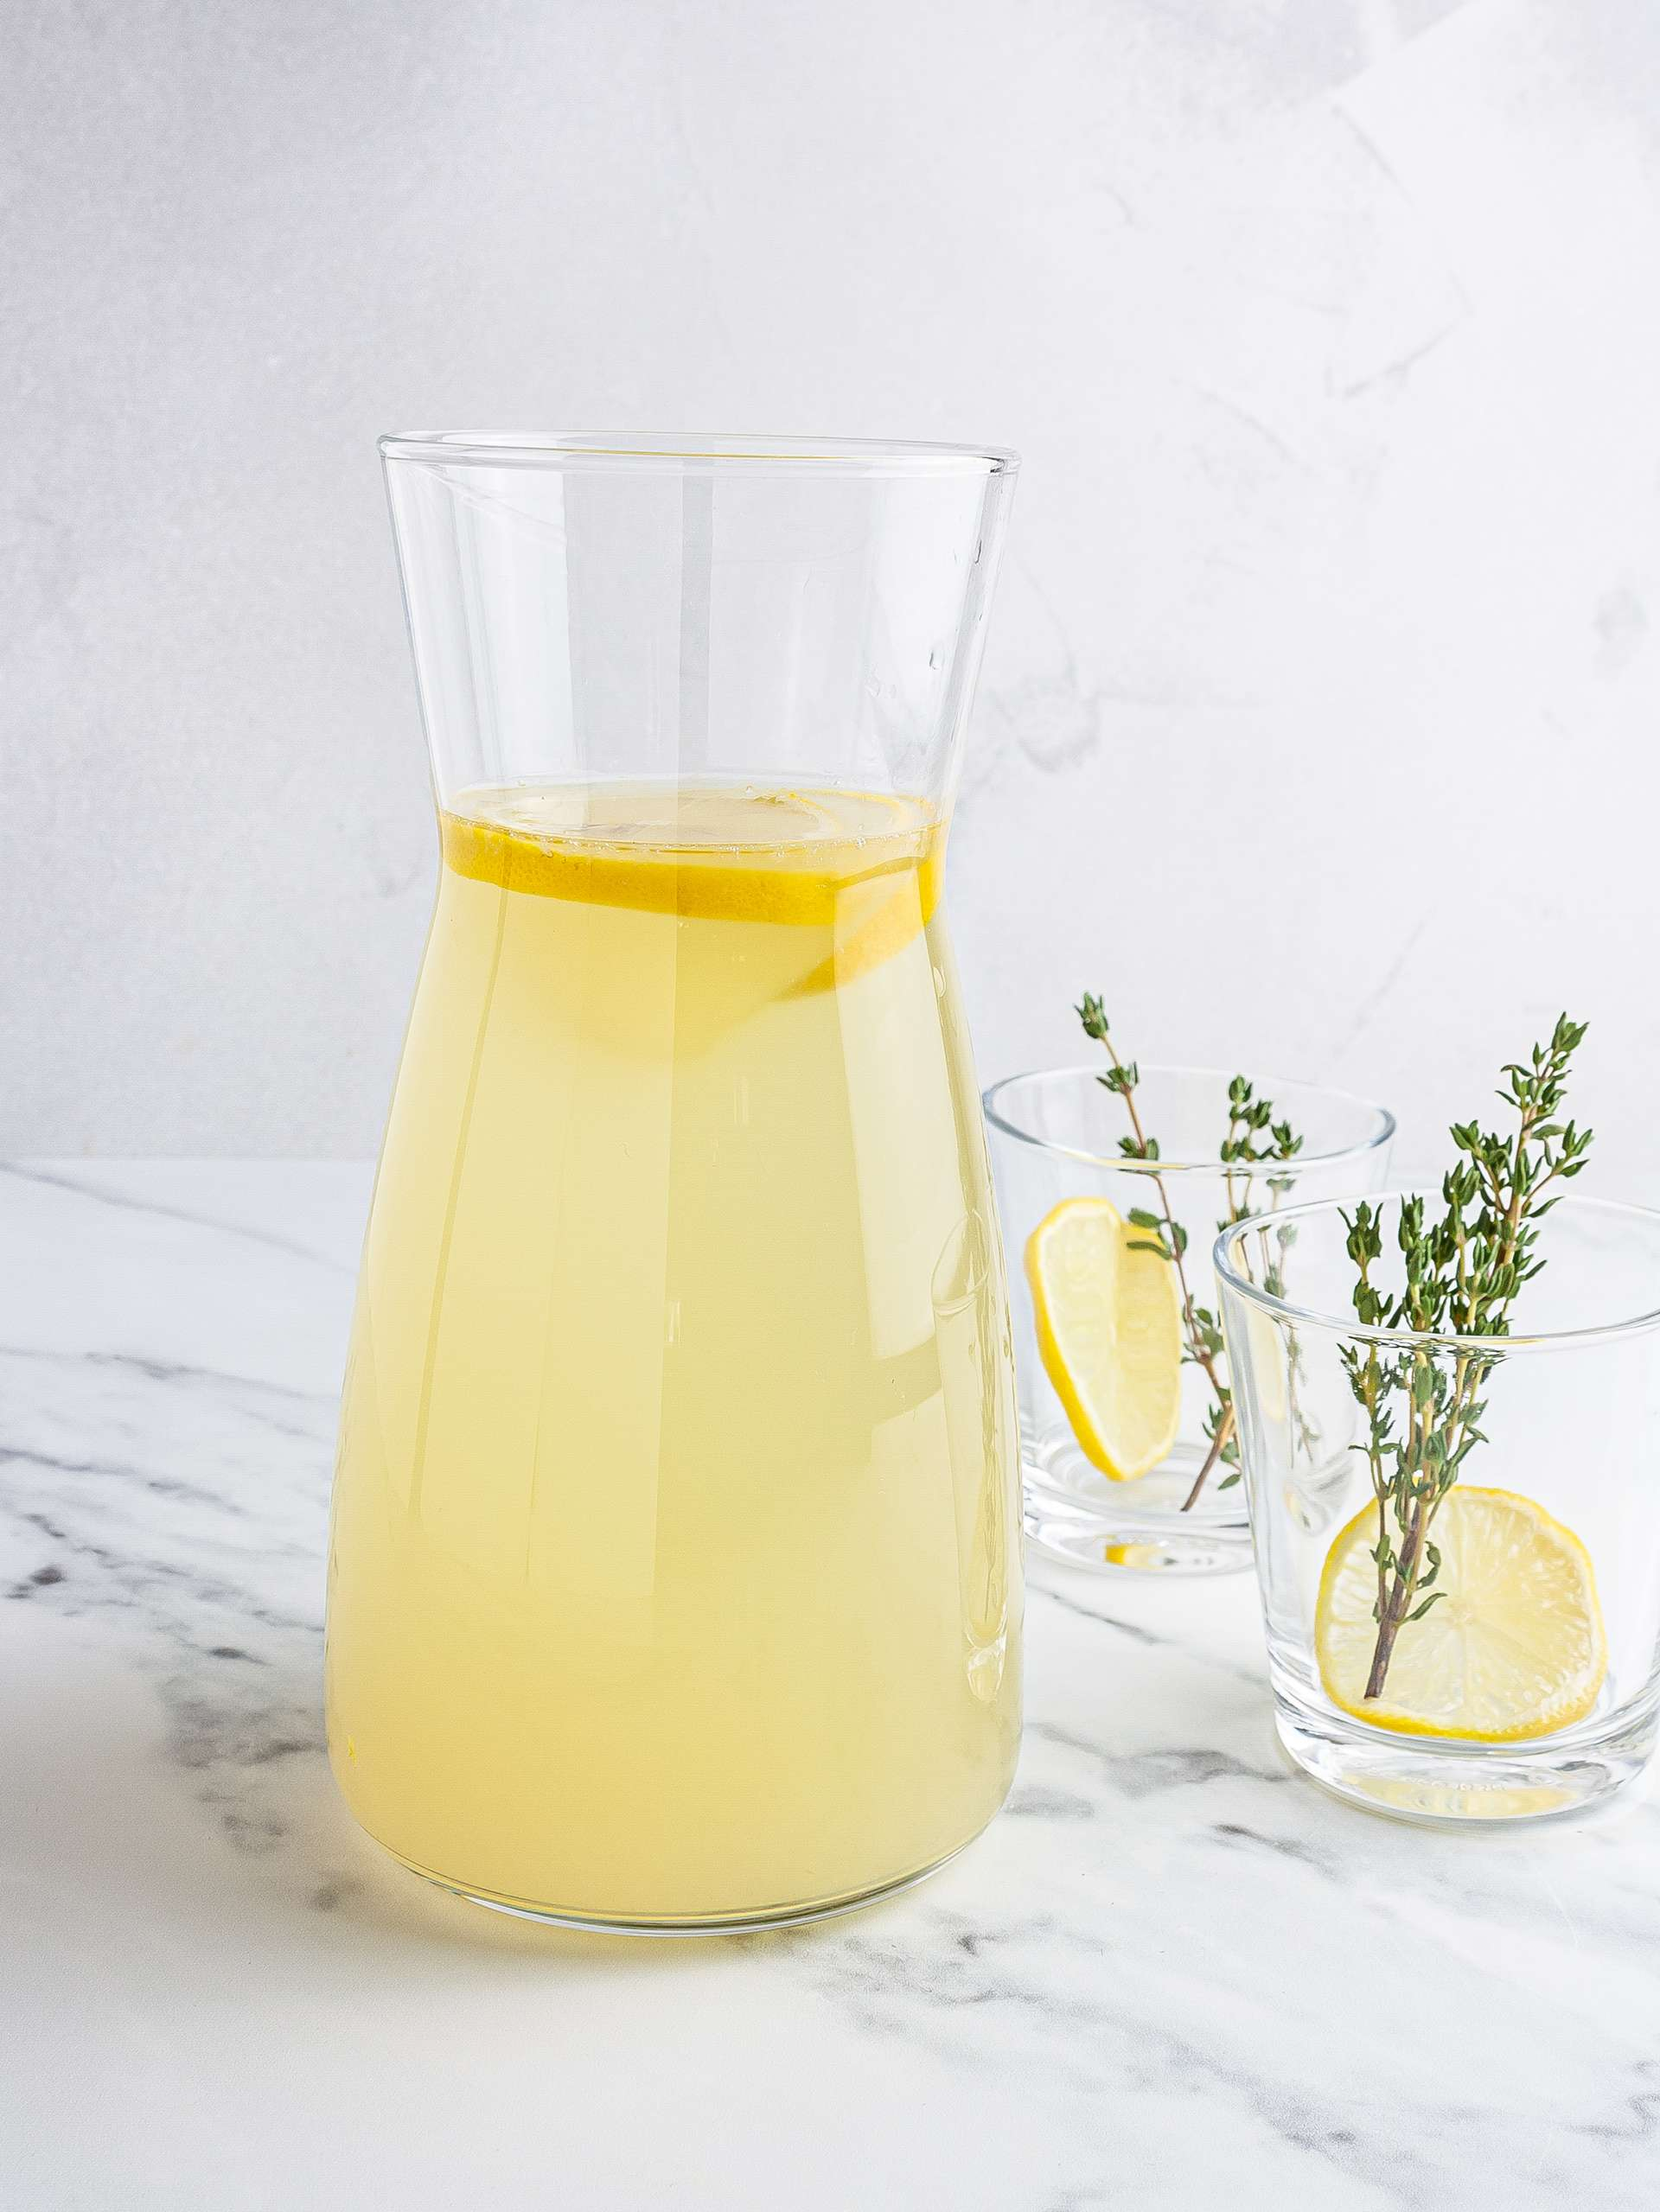 Ginger thyme lemonade in a jug